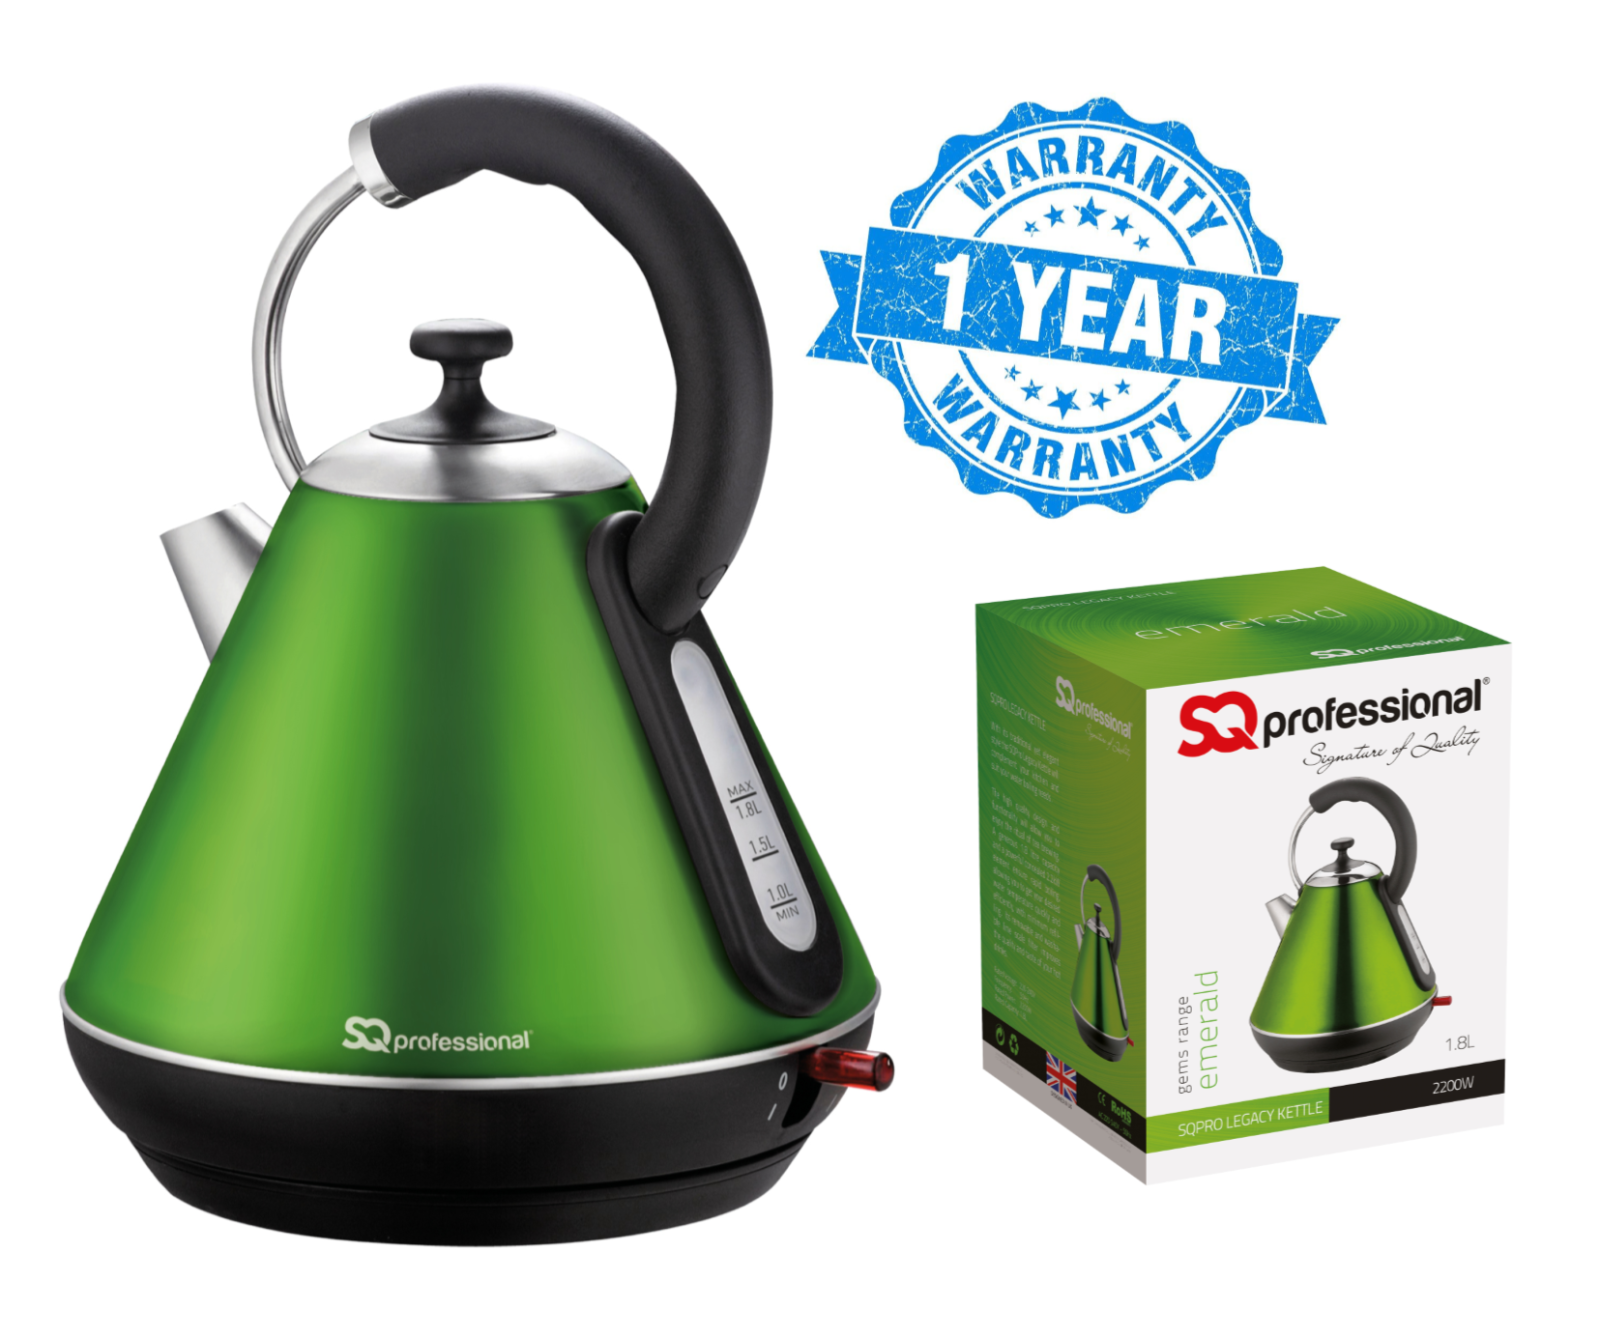 Emerald Green 2200W 1.8L Fast Boil Legacy Cordless Electric Kettle